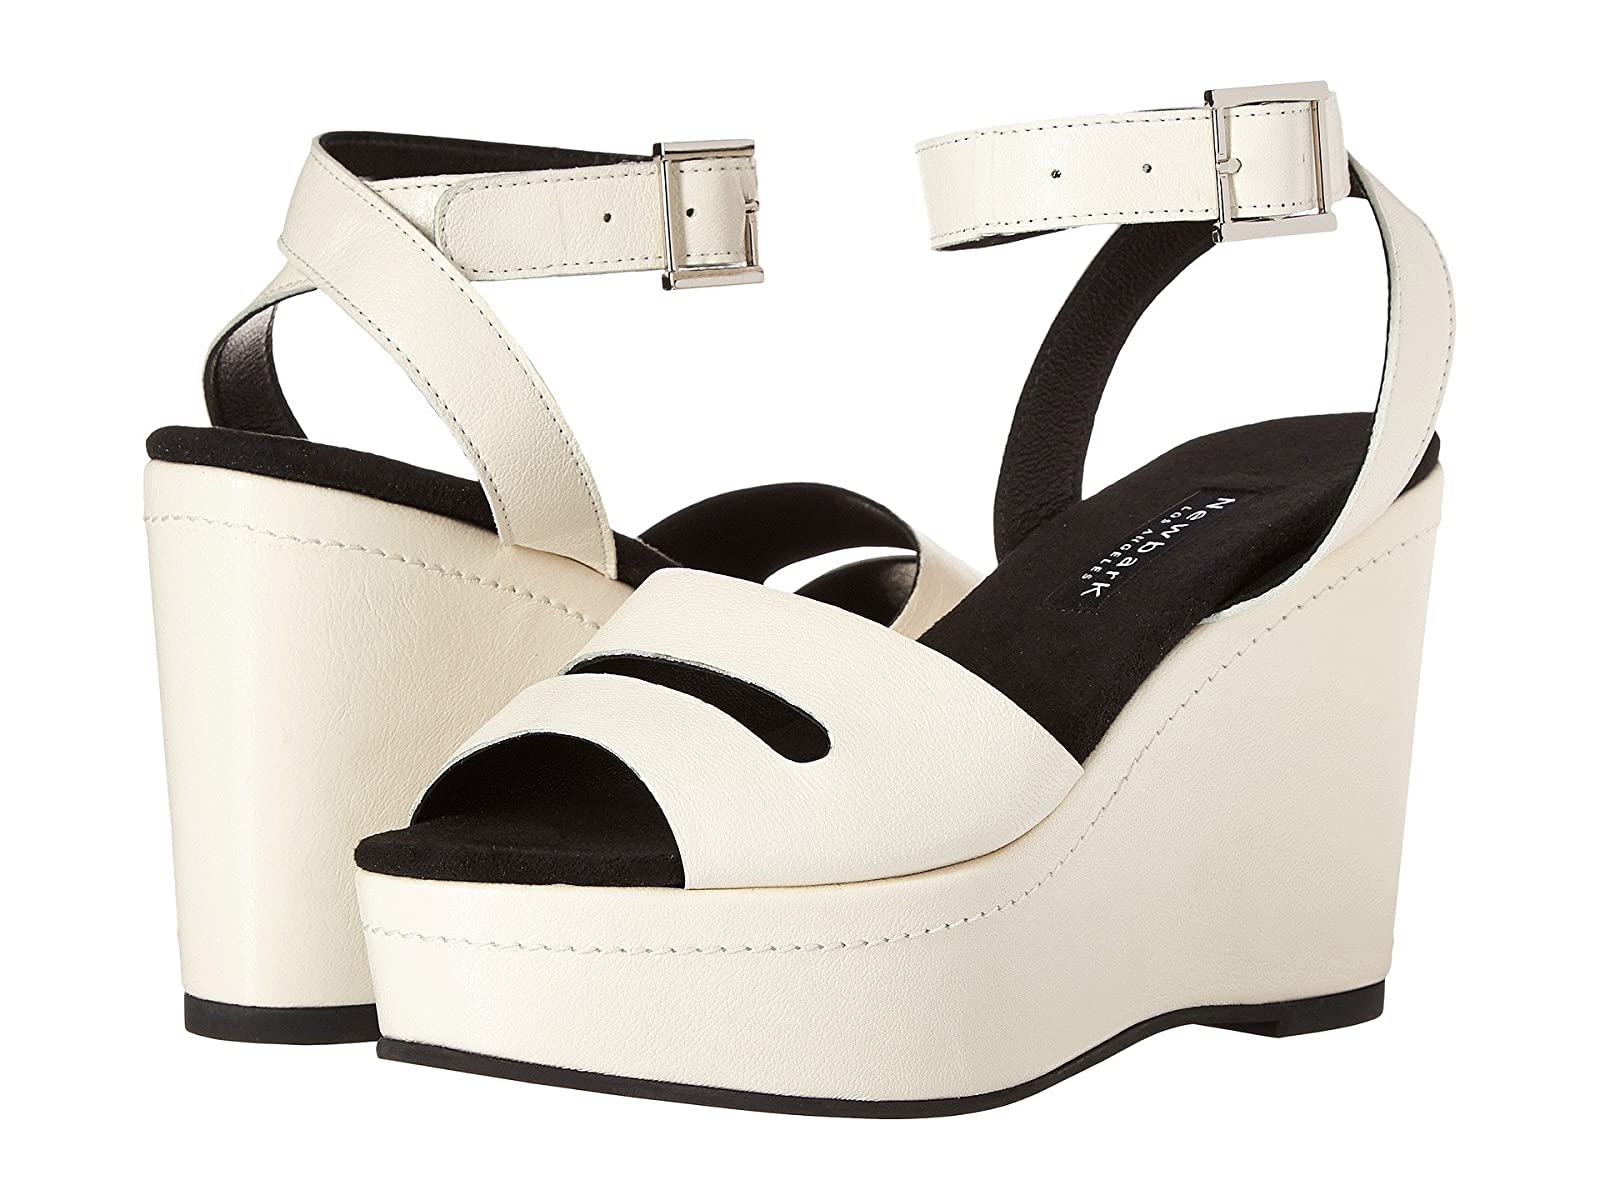 NewbarK Maggie WedgeCheap and distinctive eye-catching shoes